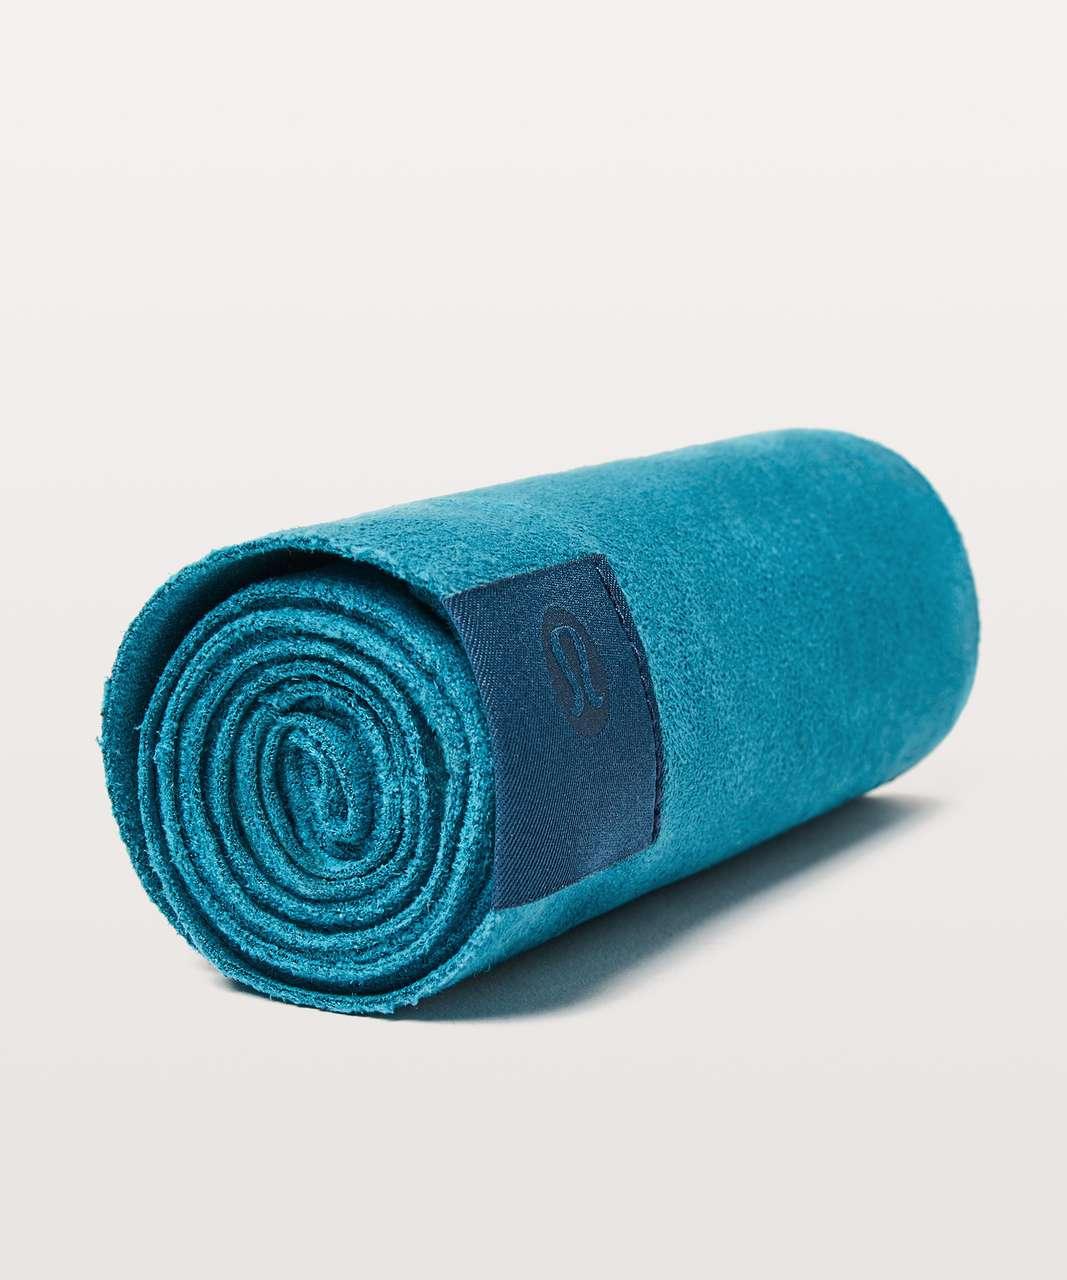 Lululemon The (Small) Towel - Cyprus